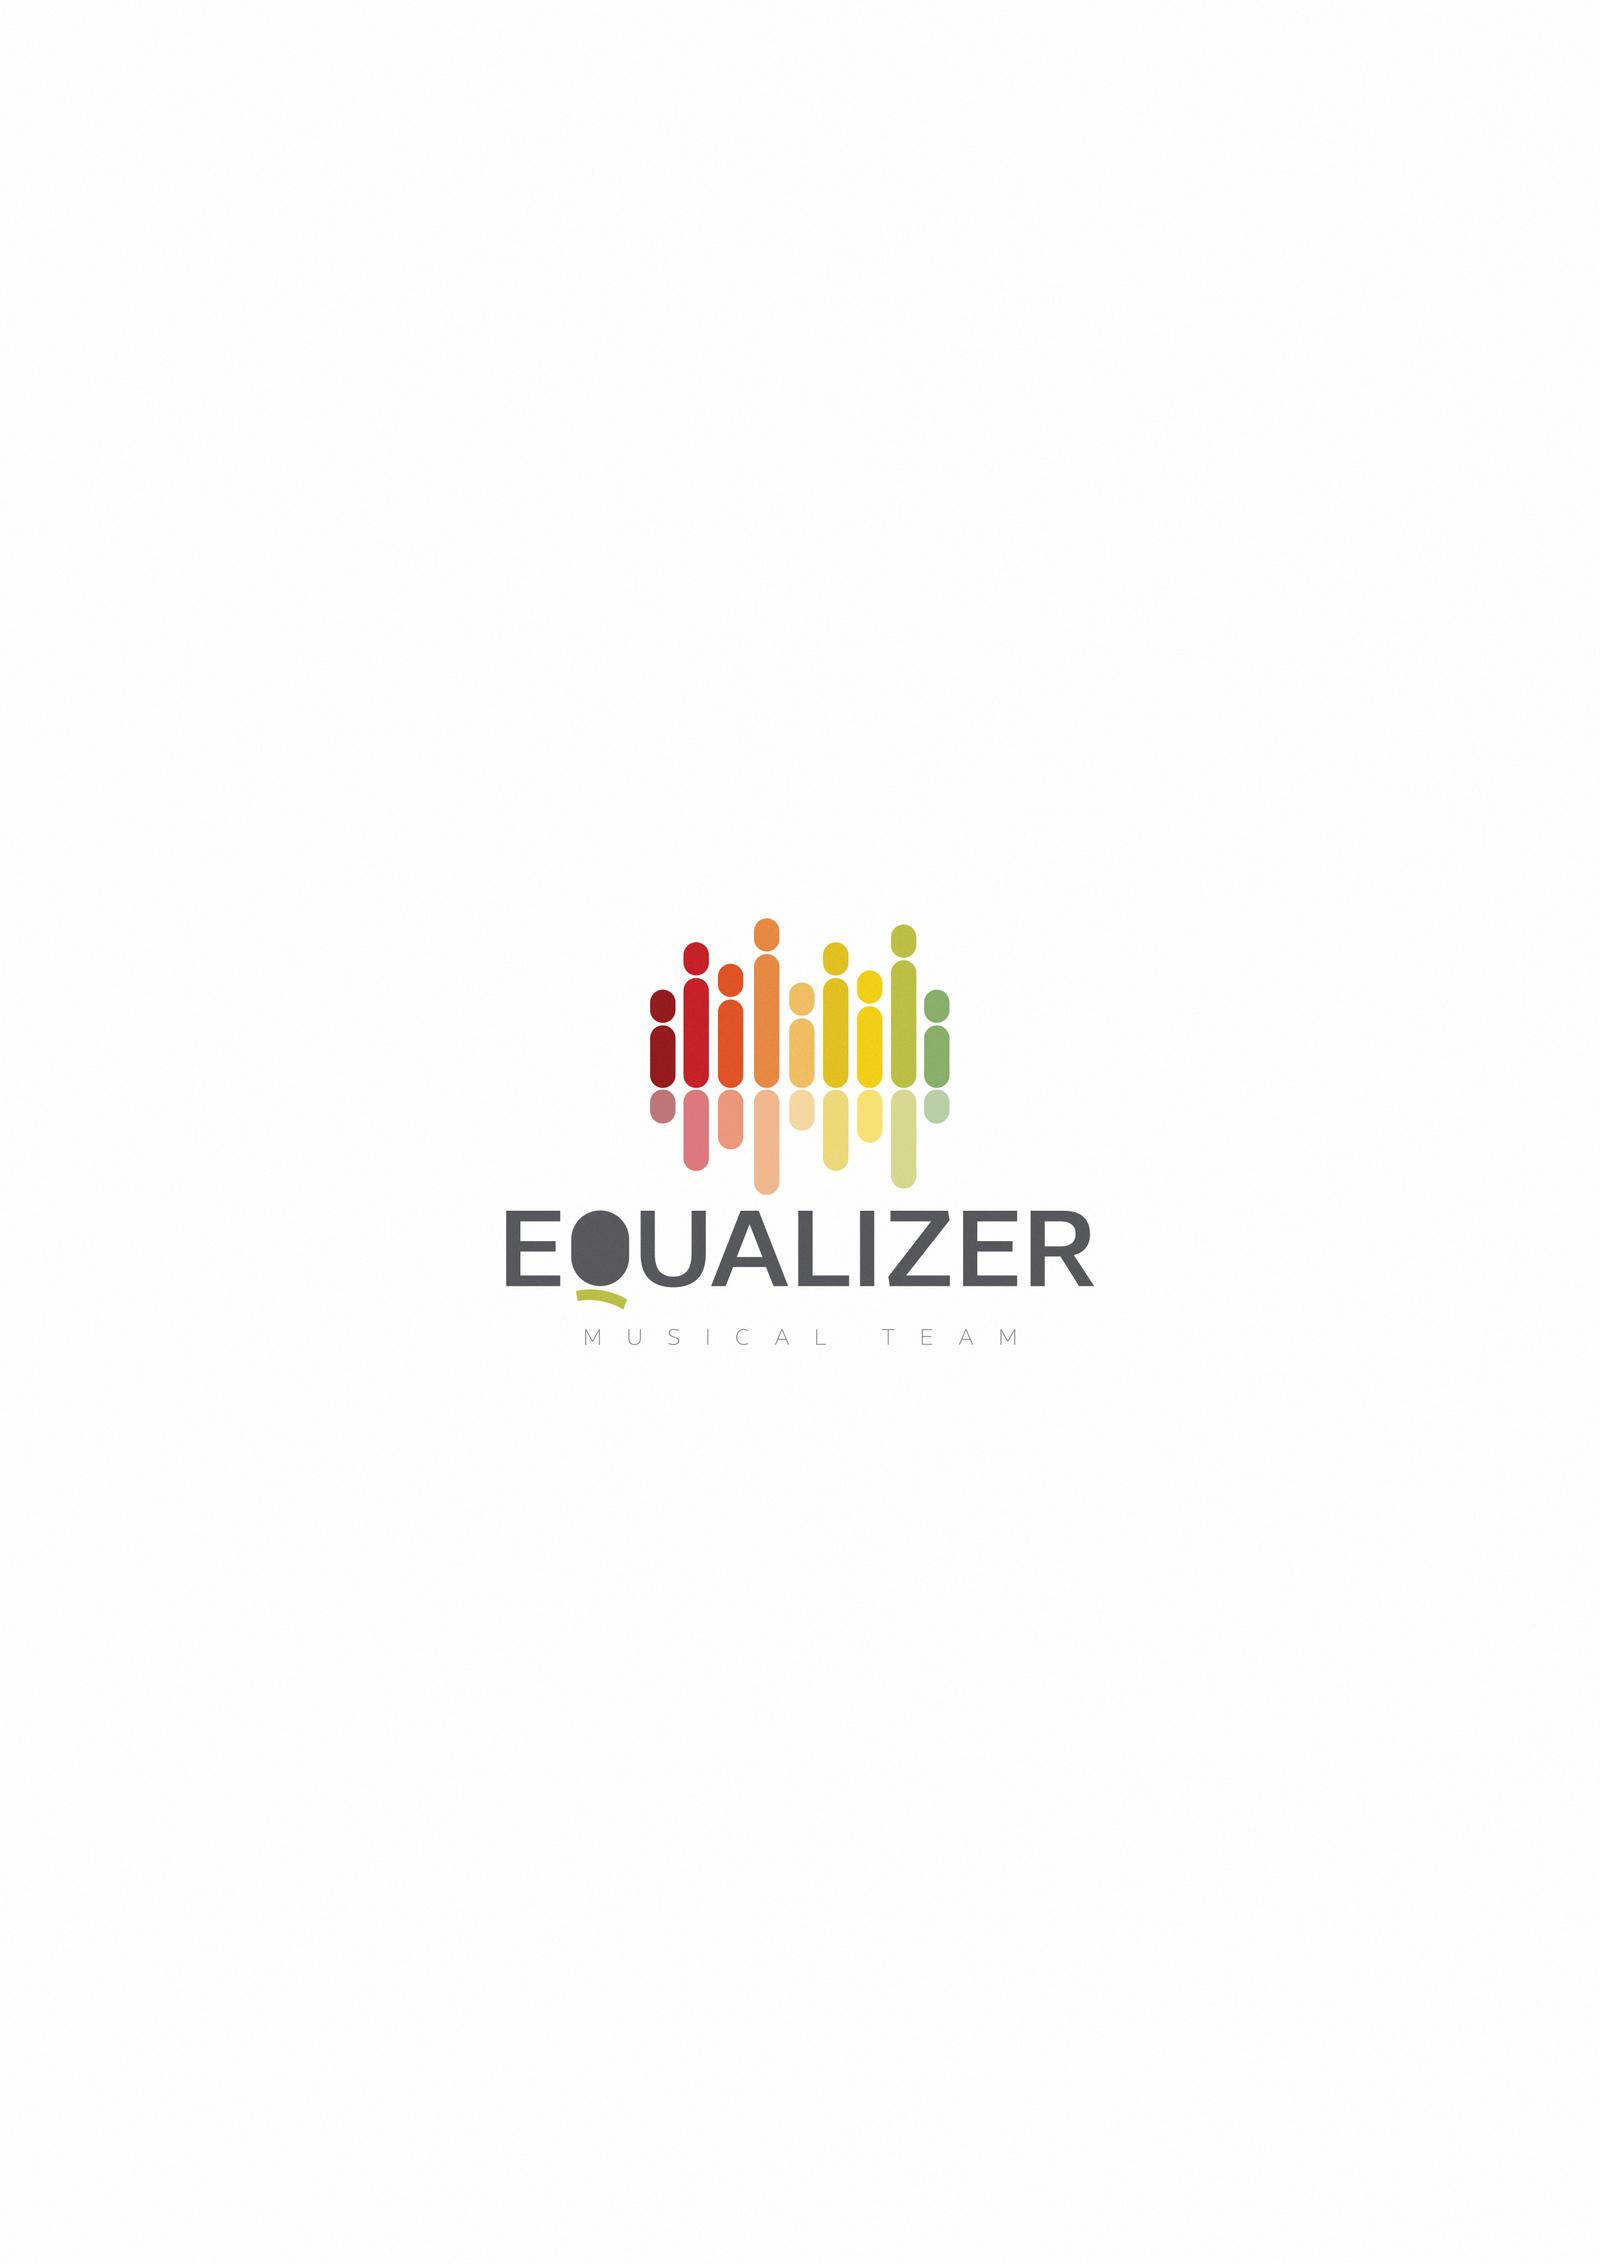 Equalizer logo design